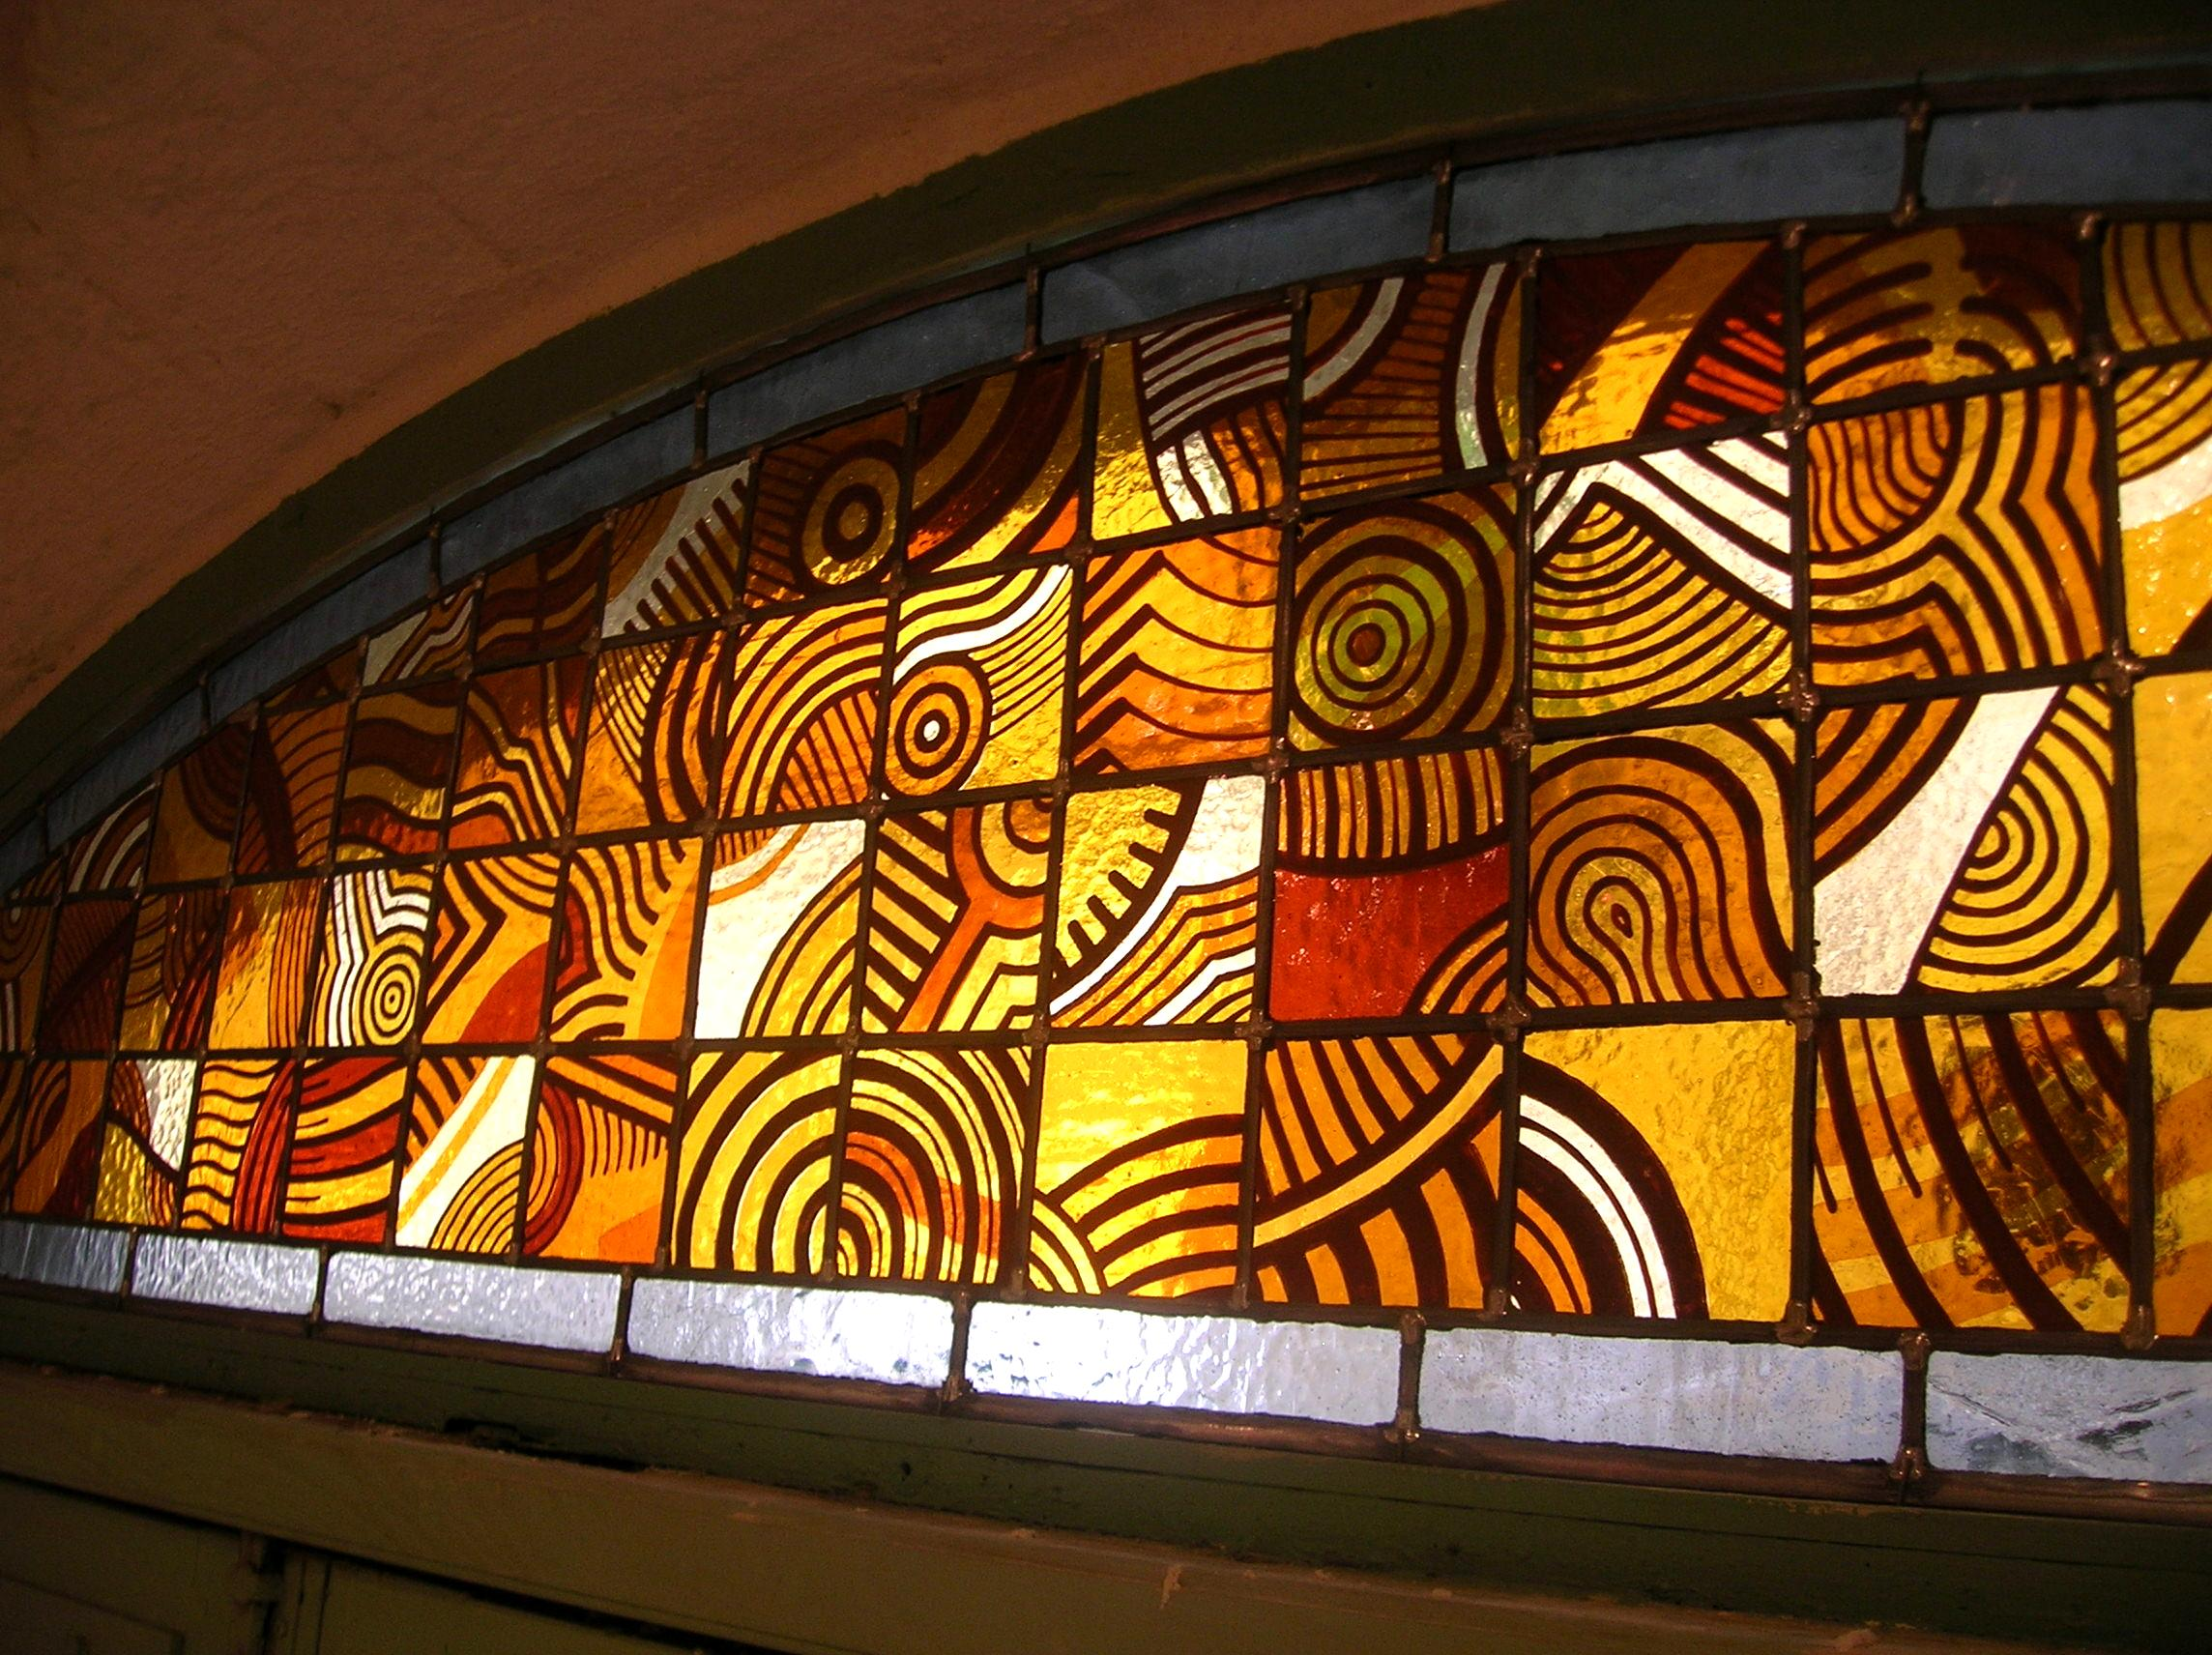 file peinture sur verre vitrail jpg wikimedia commons On peinture sur verre